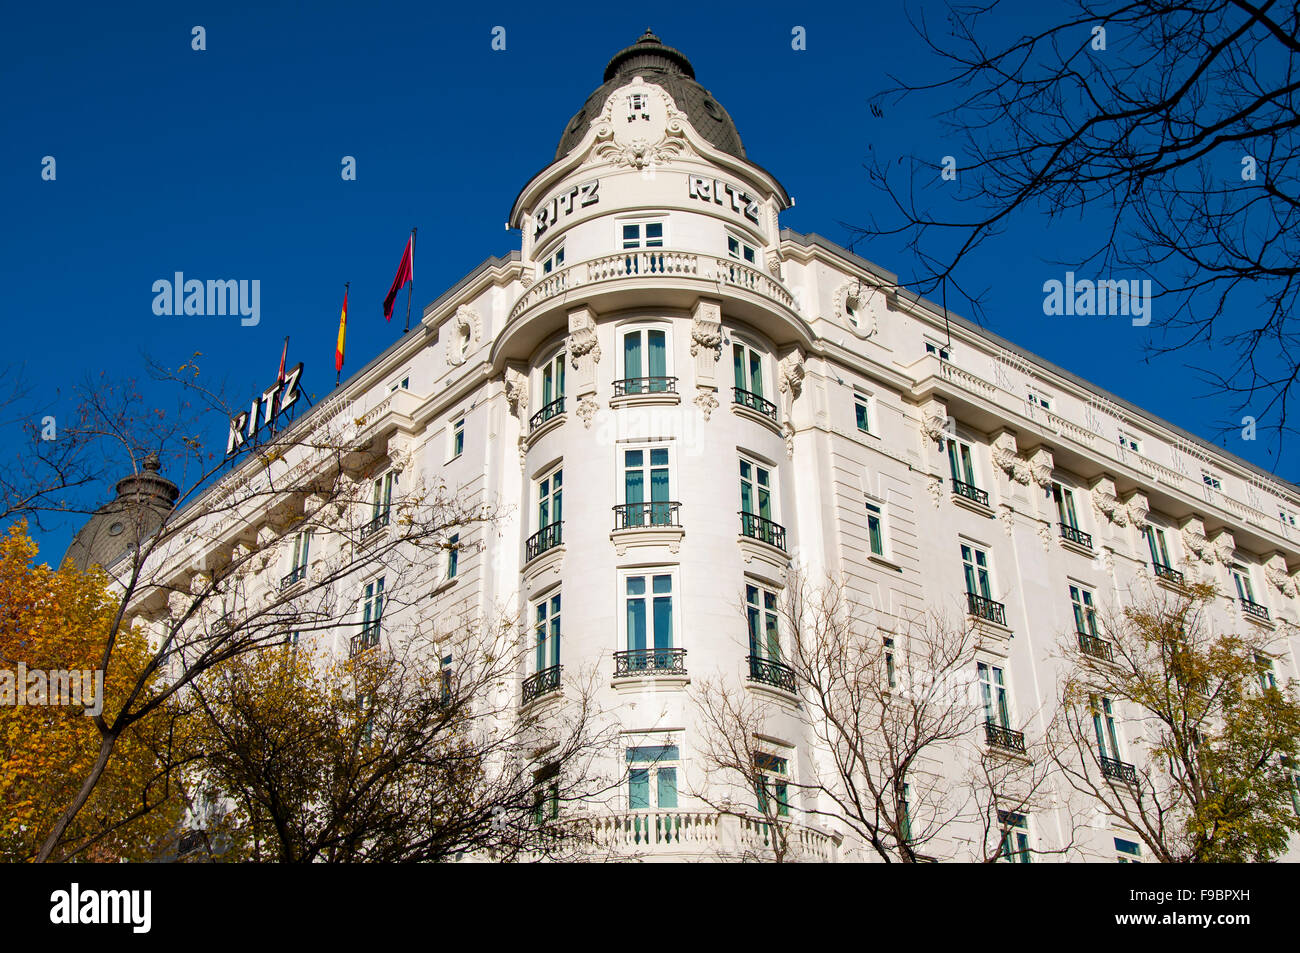 Hotel Ritz, Madrid, Spain - Stock Image